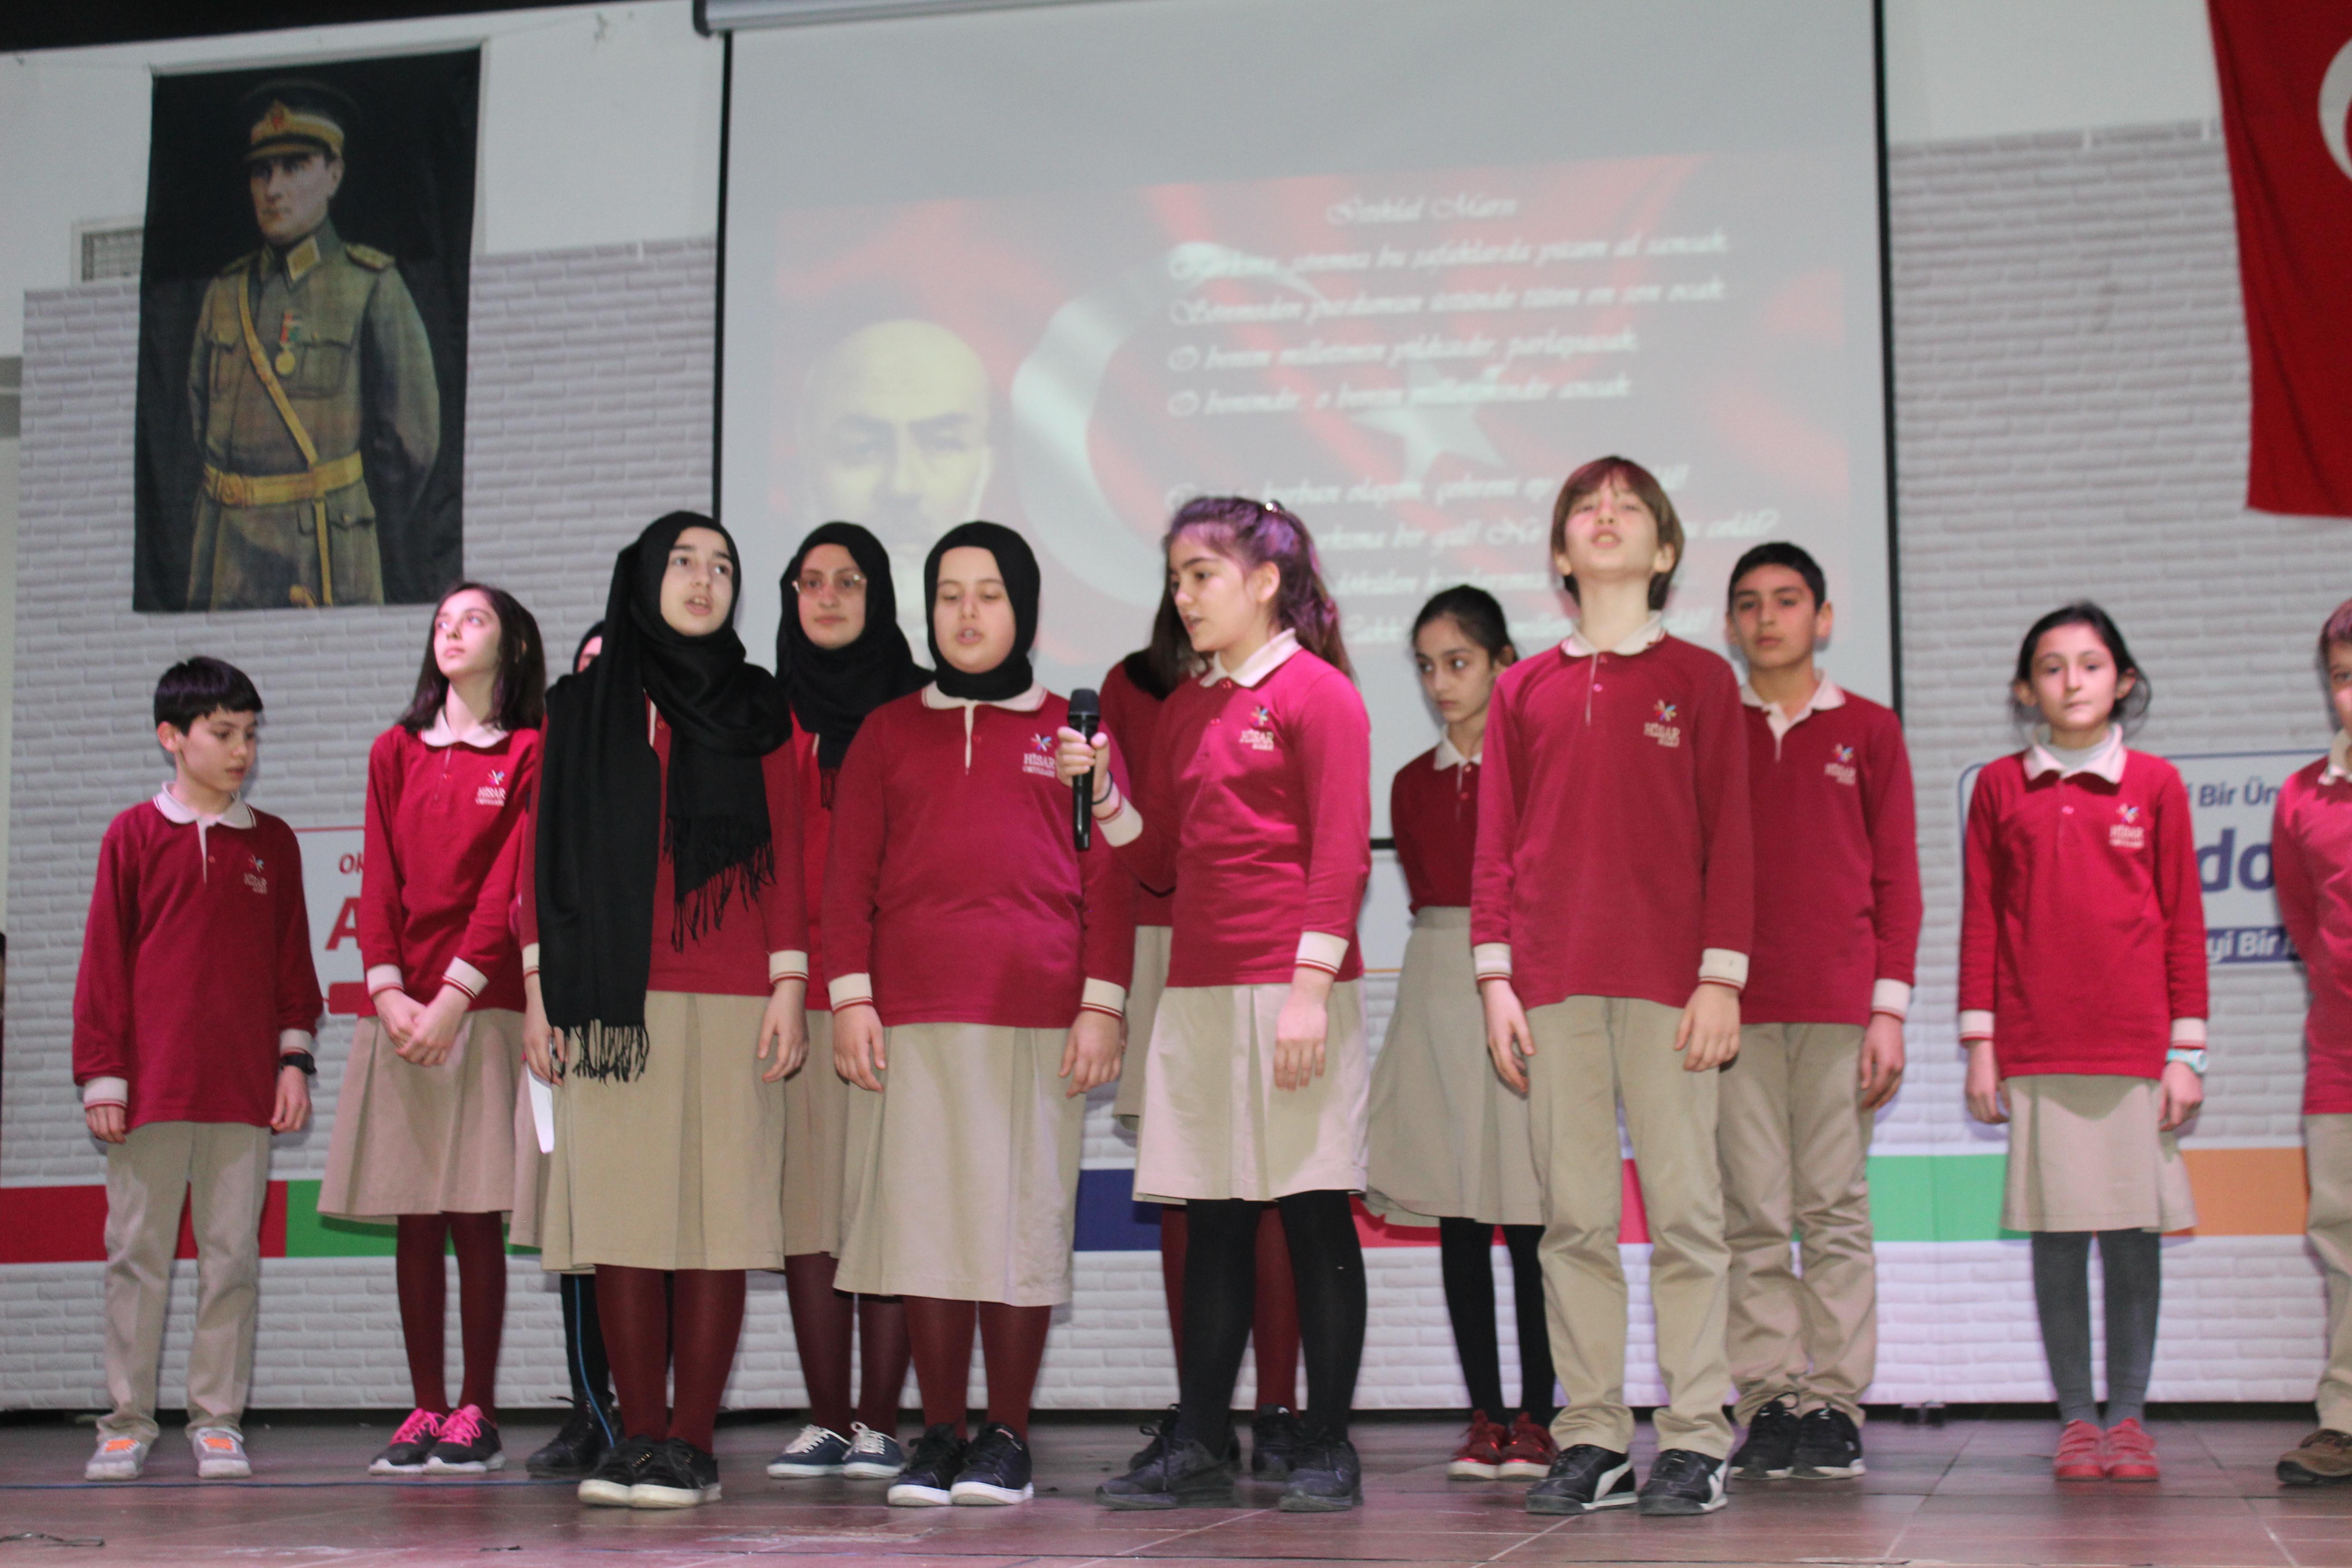 Hisar Koleji Mehmet Akif Ersoy'u unutmadı